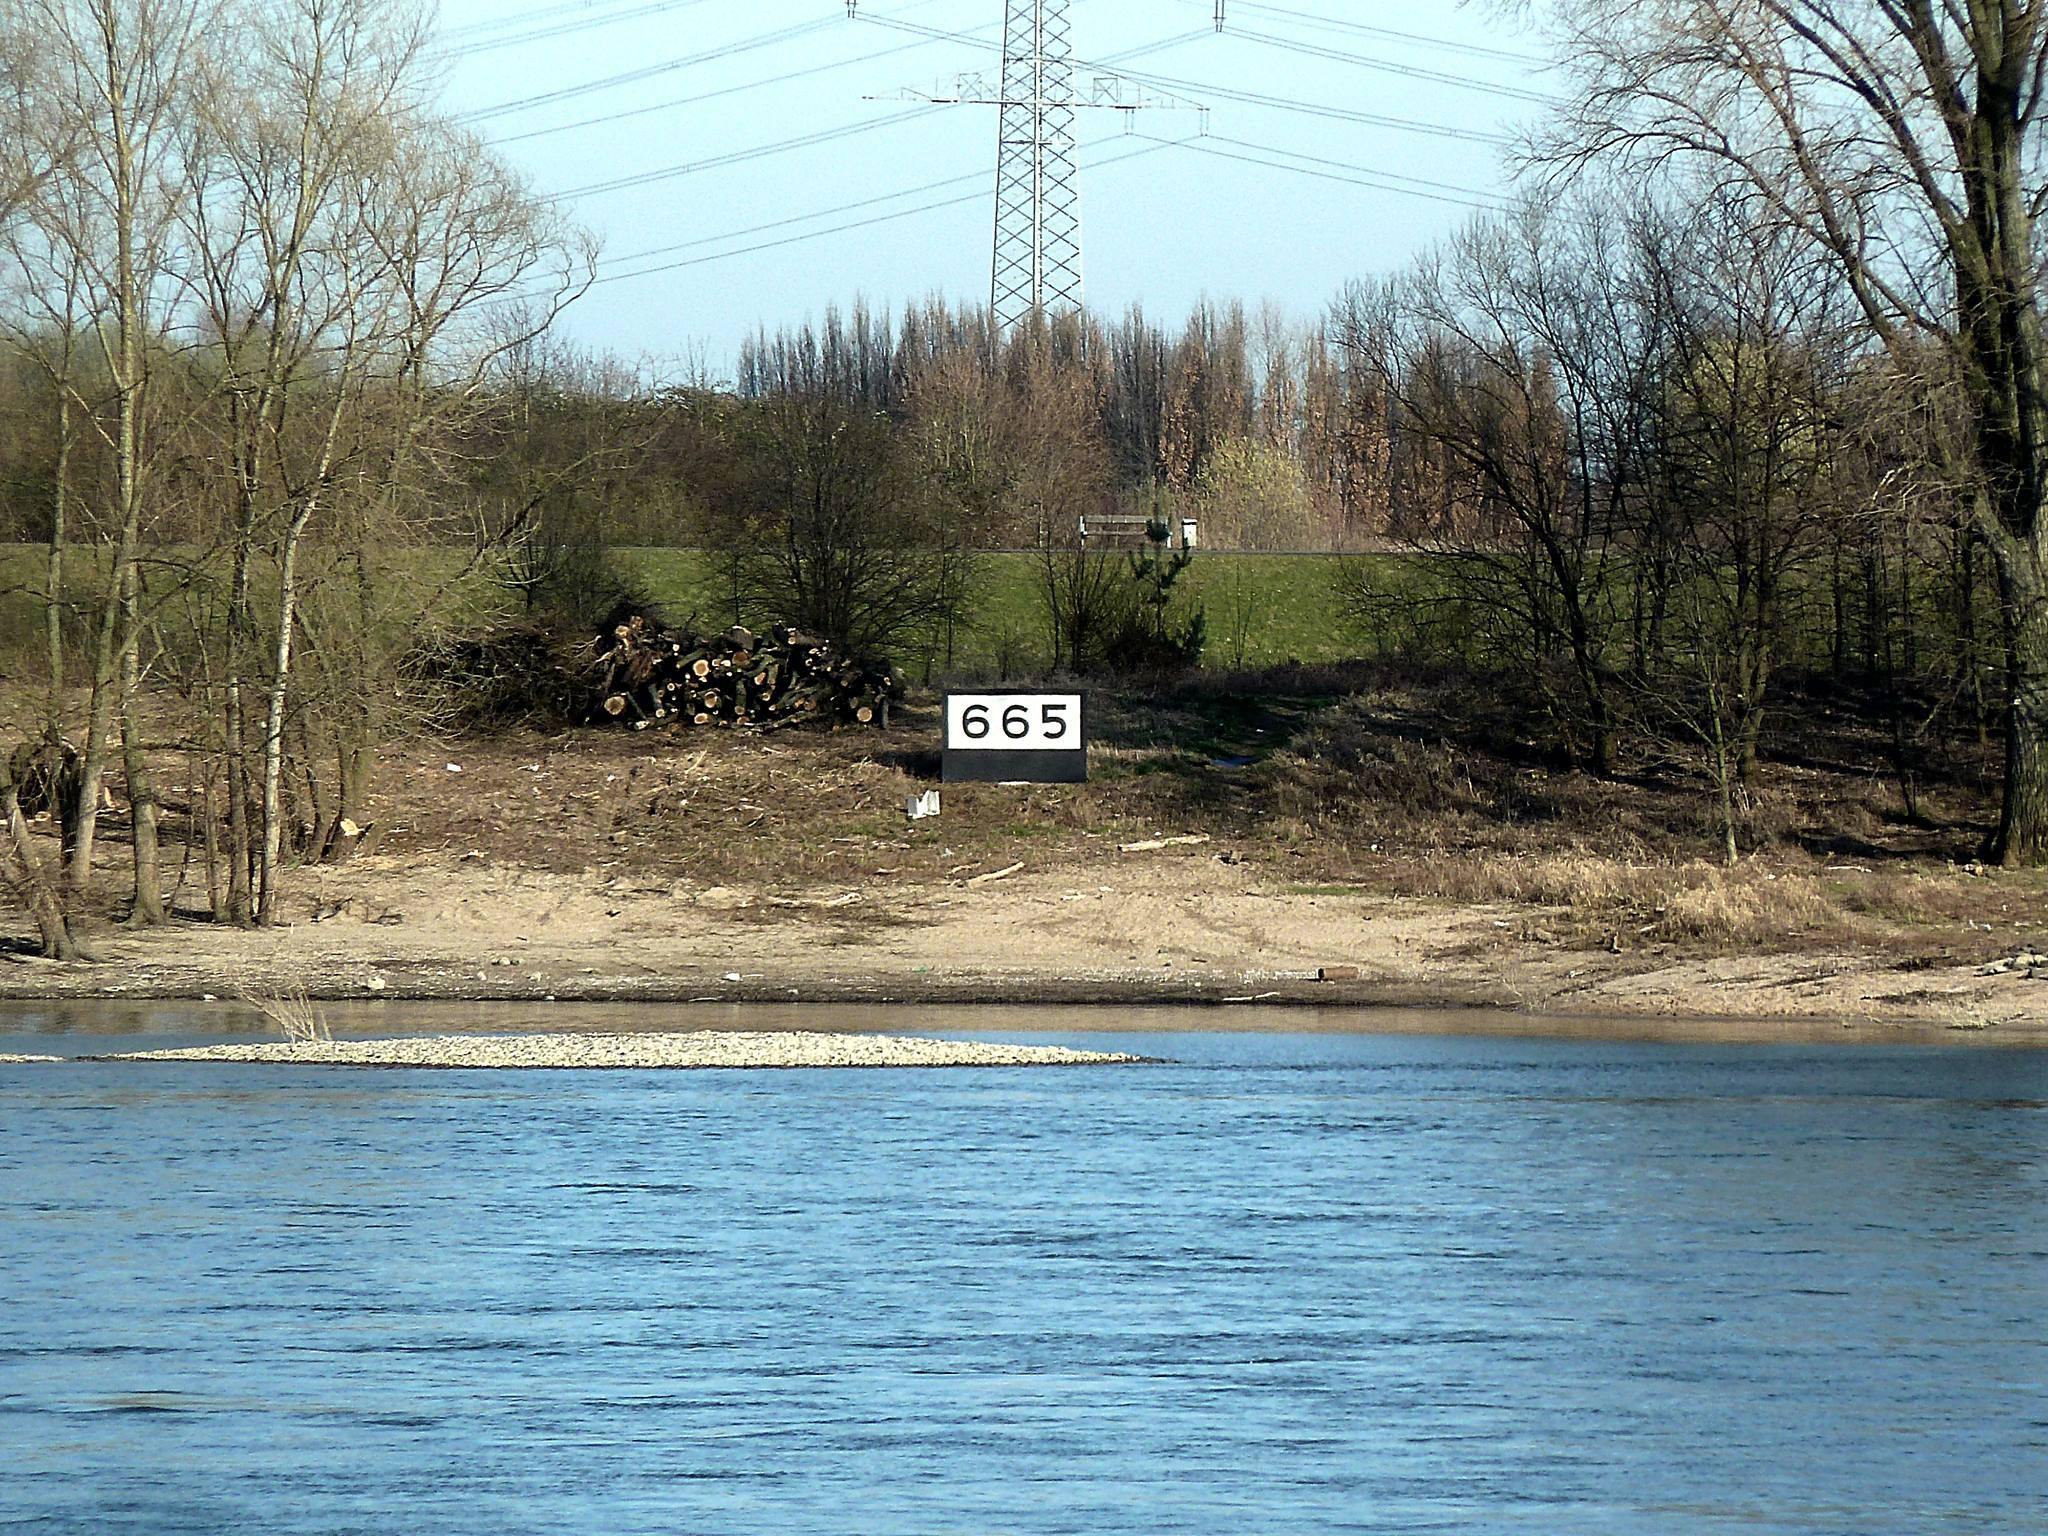 rheinkilometer-665